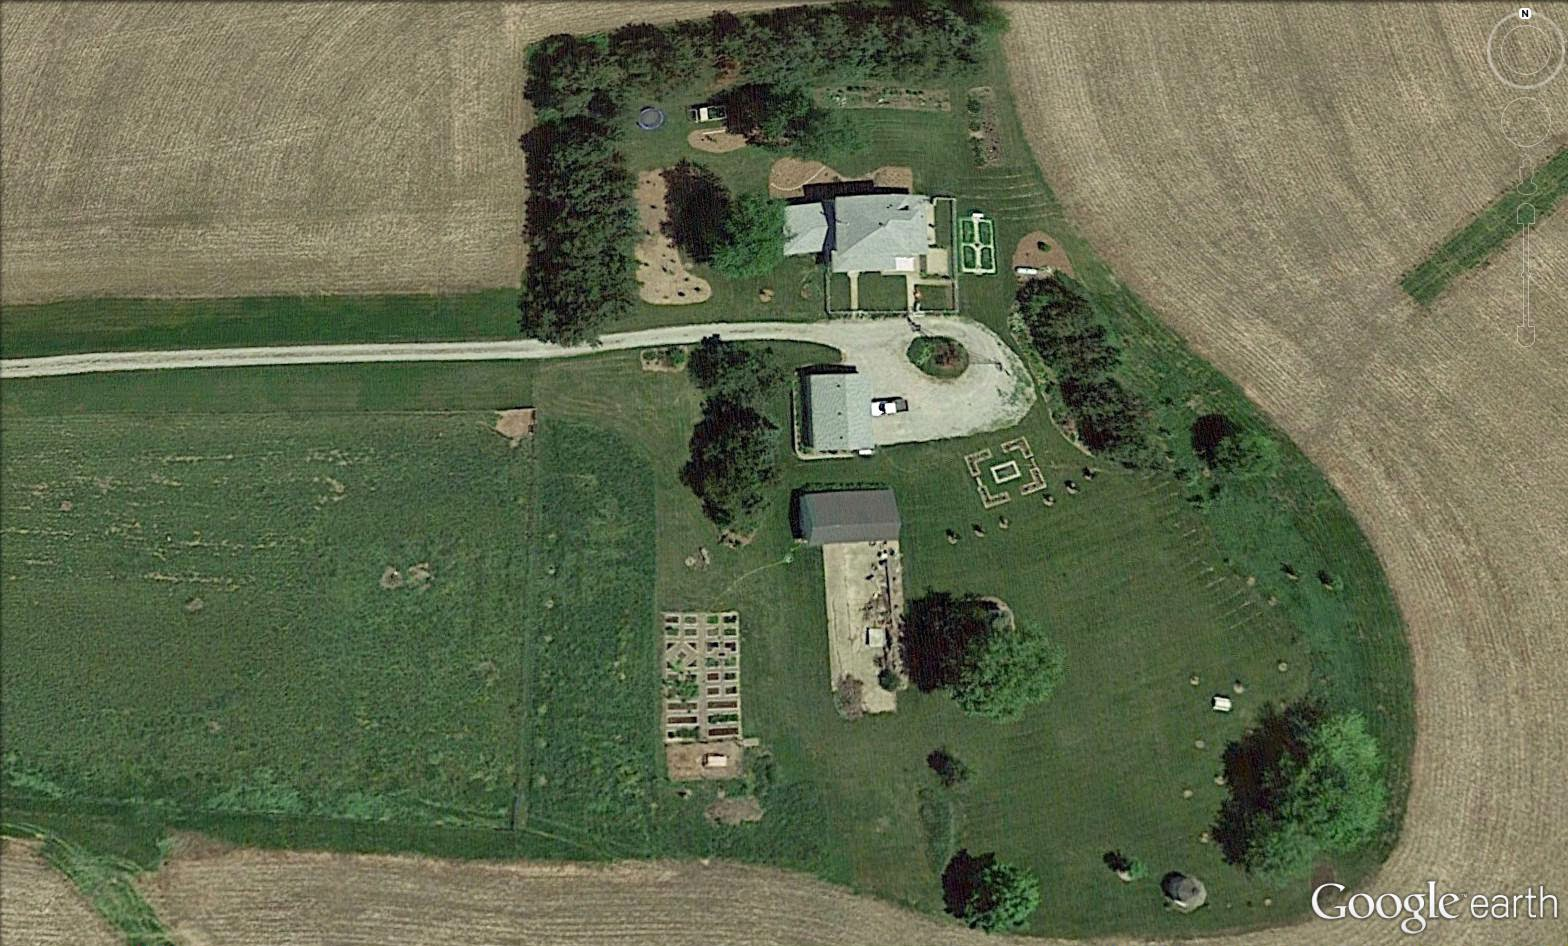 Garden Fancy A New Google Earth Aerial Photo